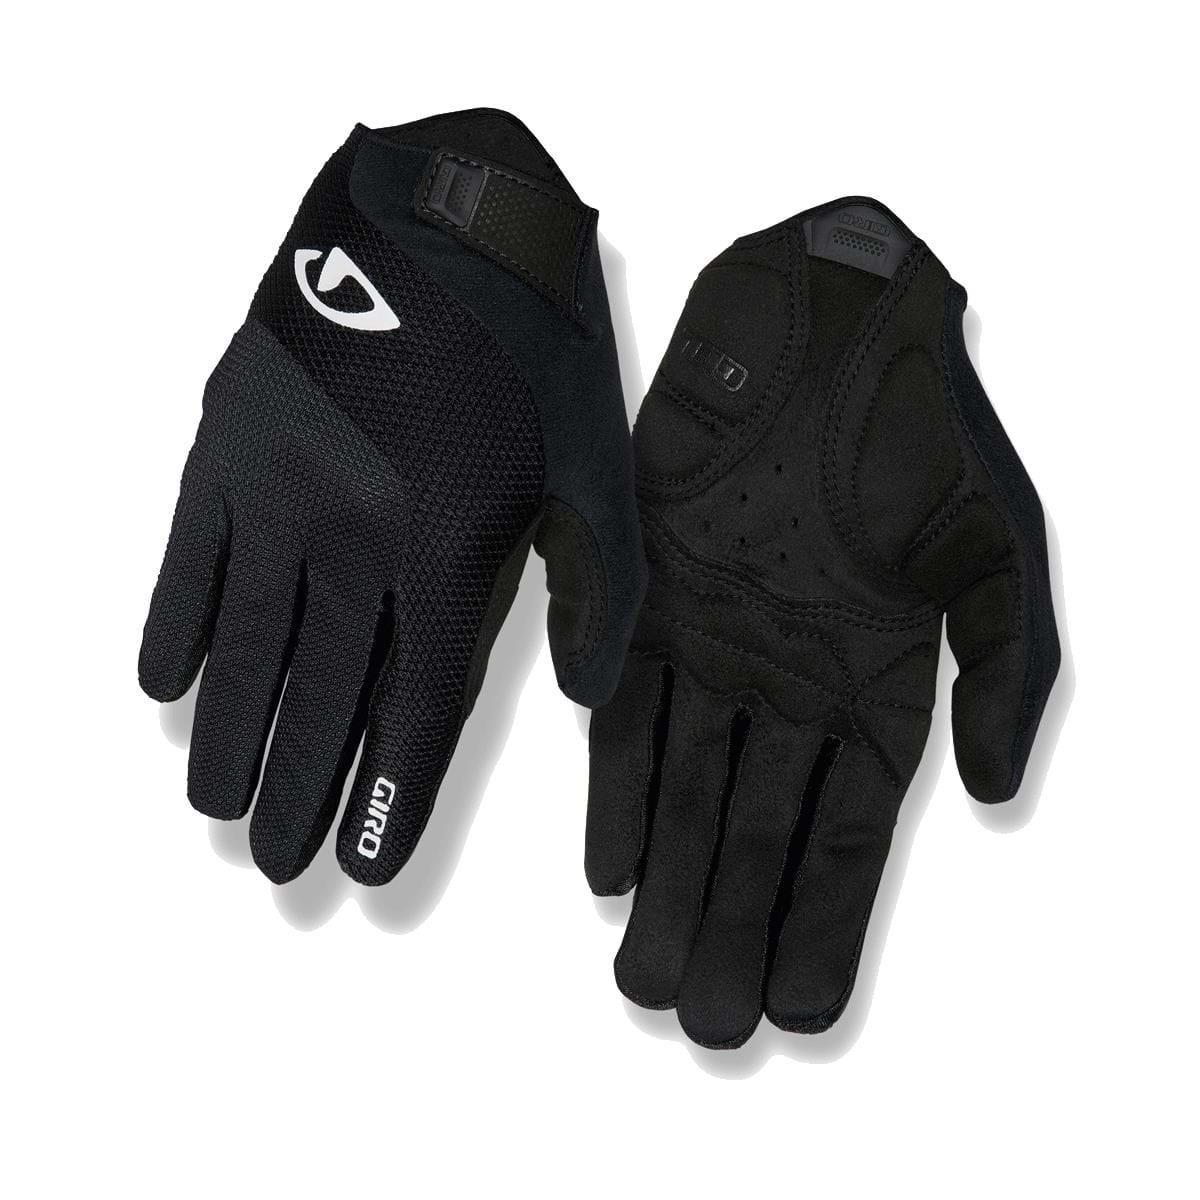 Tessa Gel LF Women's Road Cycling Glove